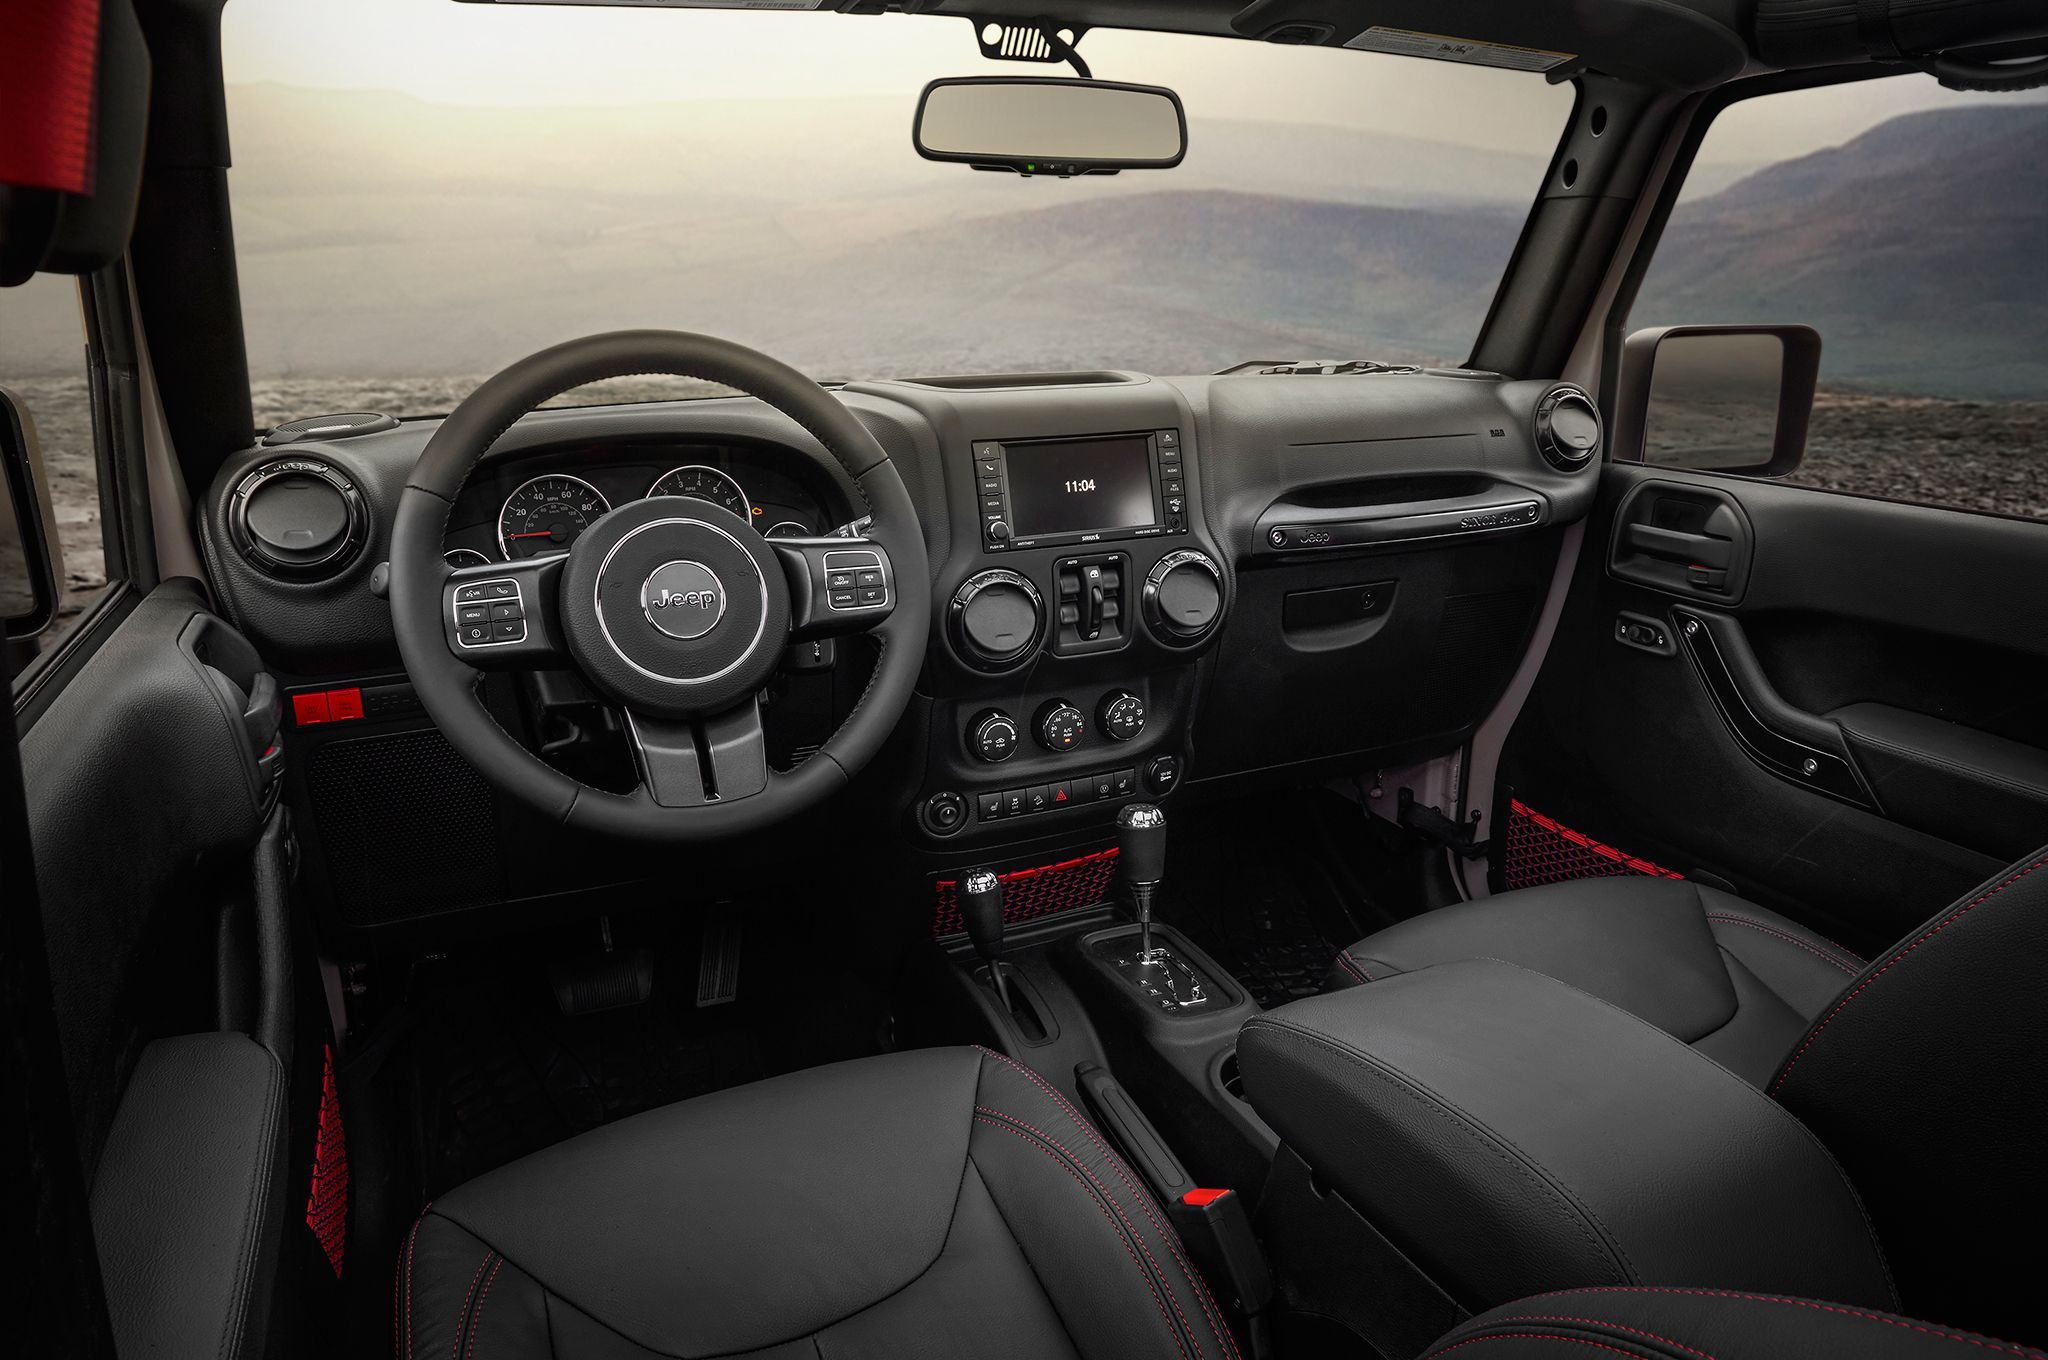 2018 Jeep Wrangler Jk Rubicon Recon Interior Jpg 2048 1360